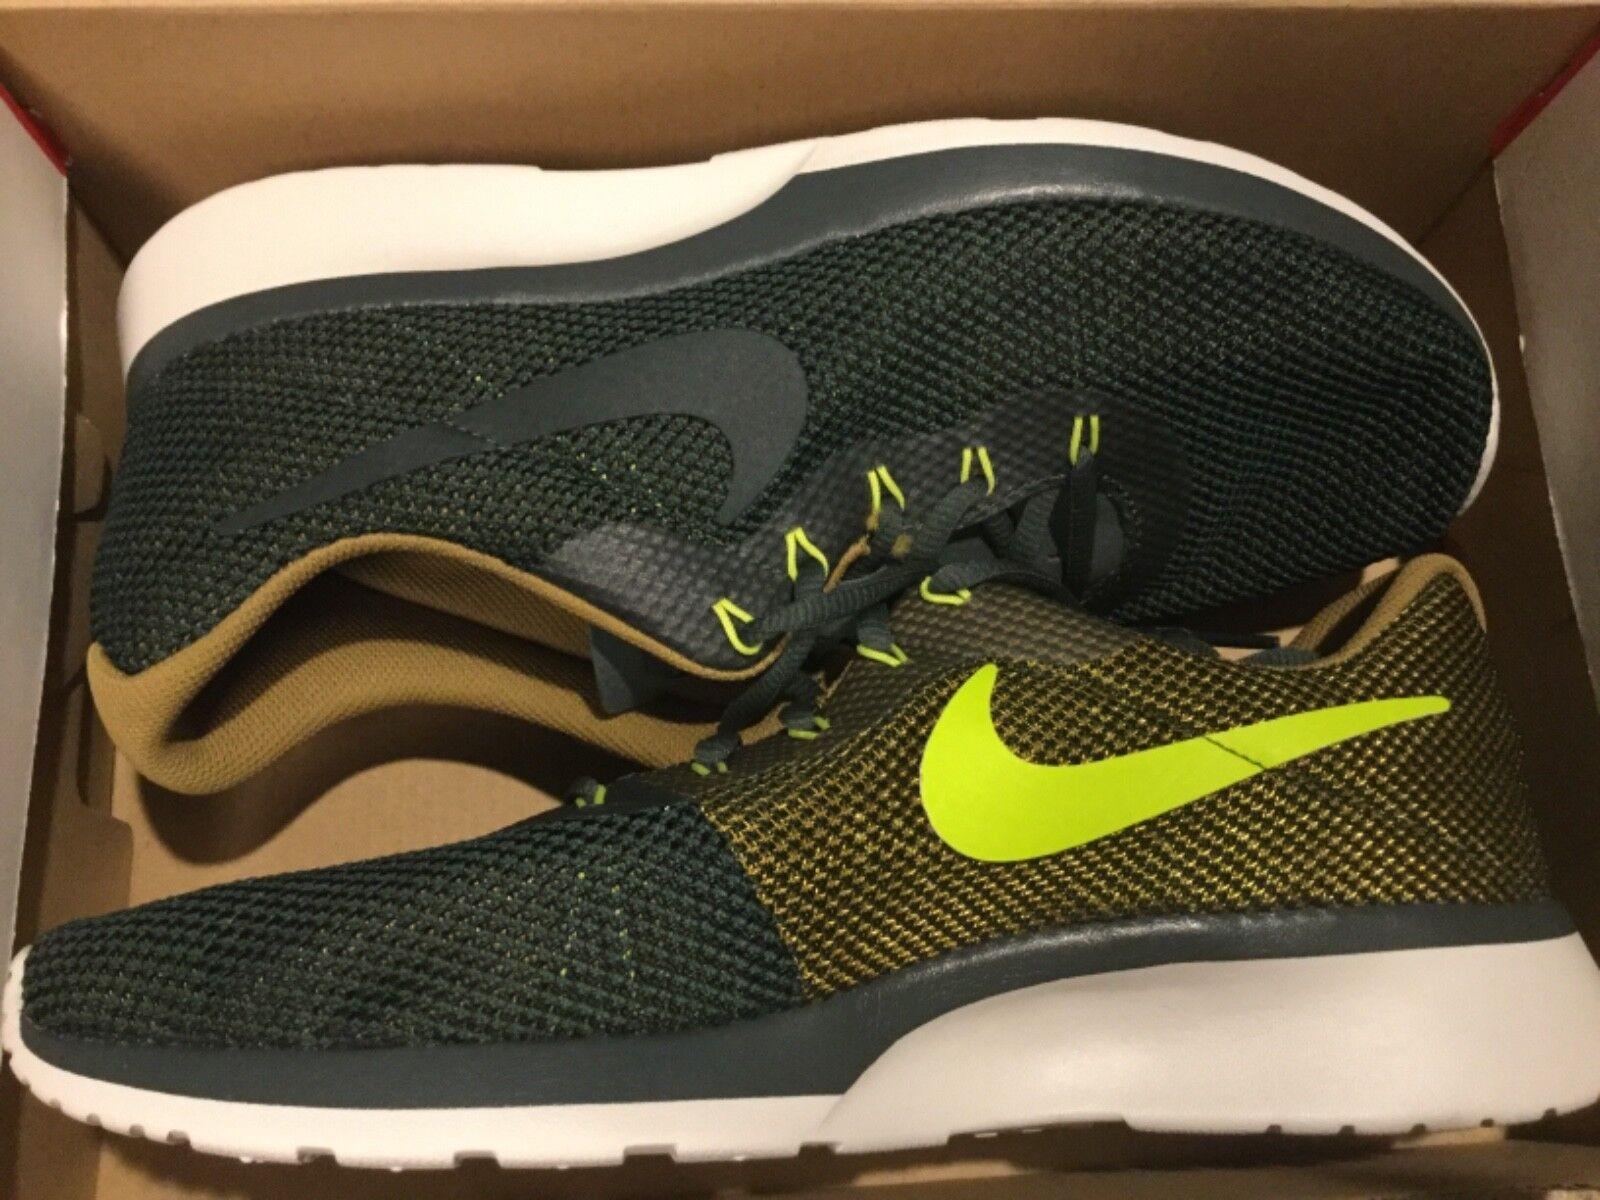 New Mens Nike Tanjun Racer Run Running Shoes 921669-300 Sz 10.5 Comfortable and good-looking